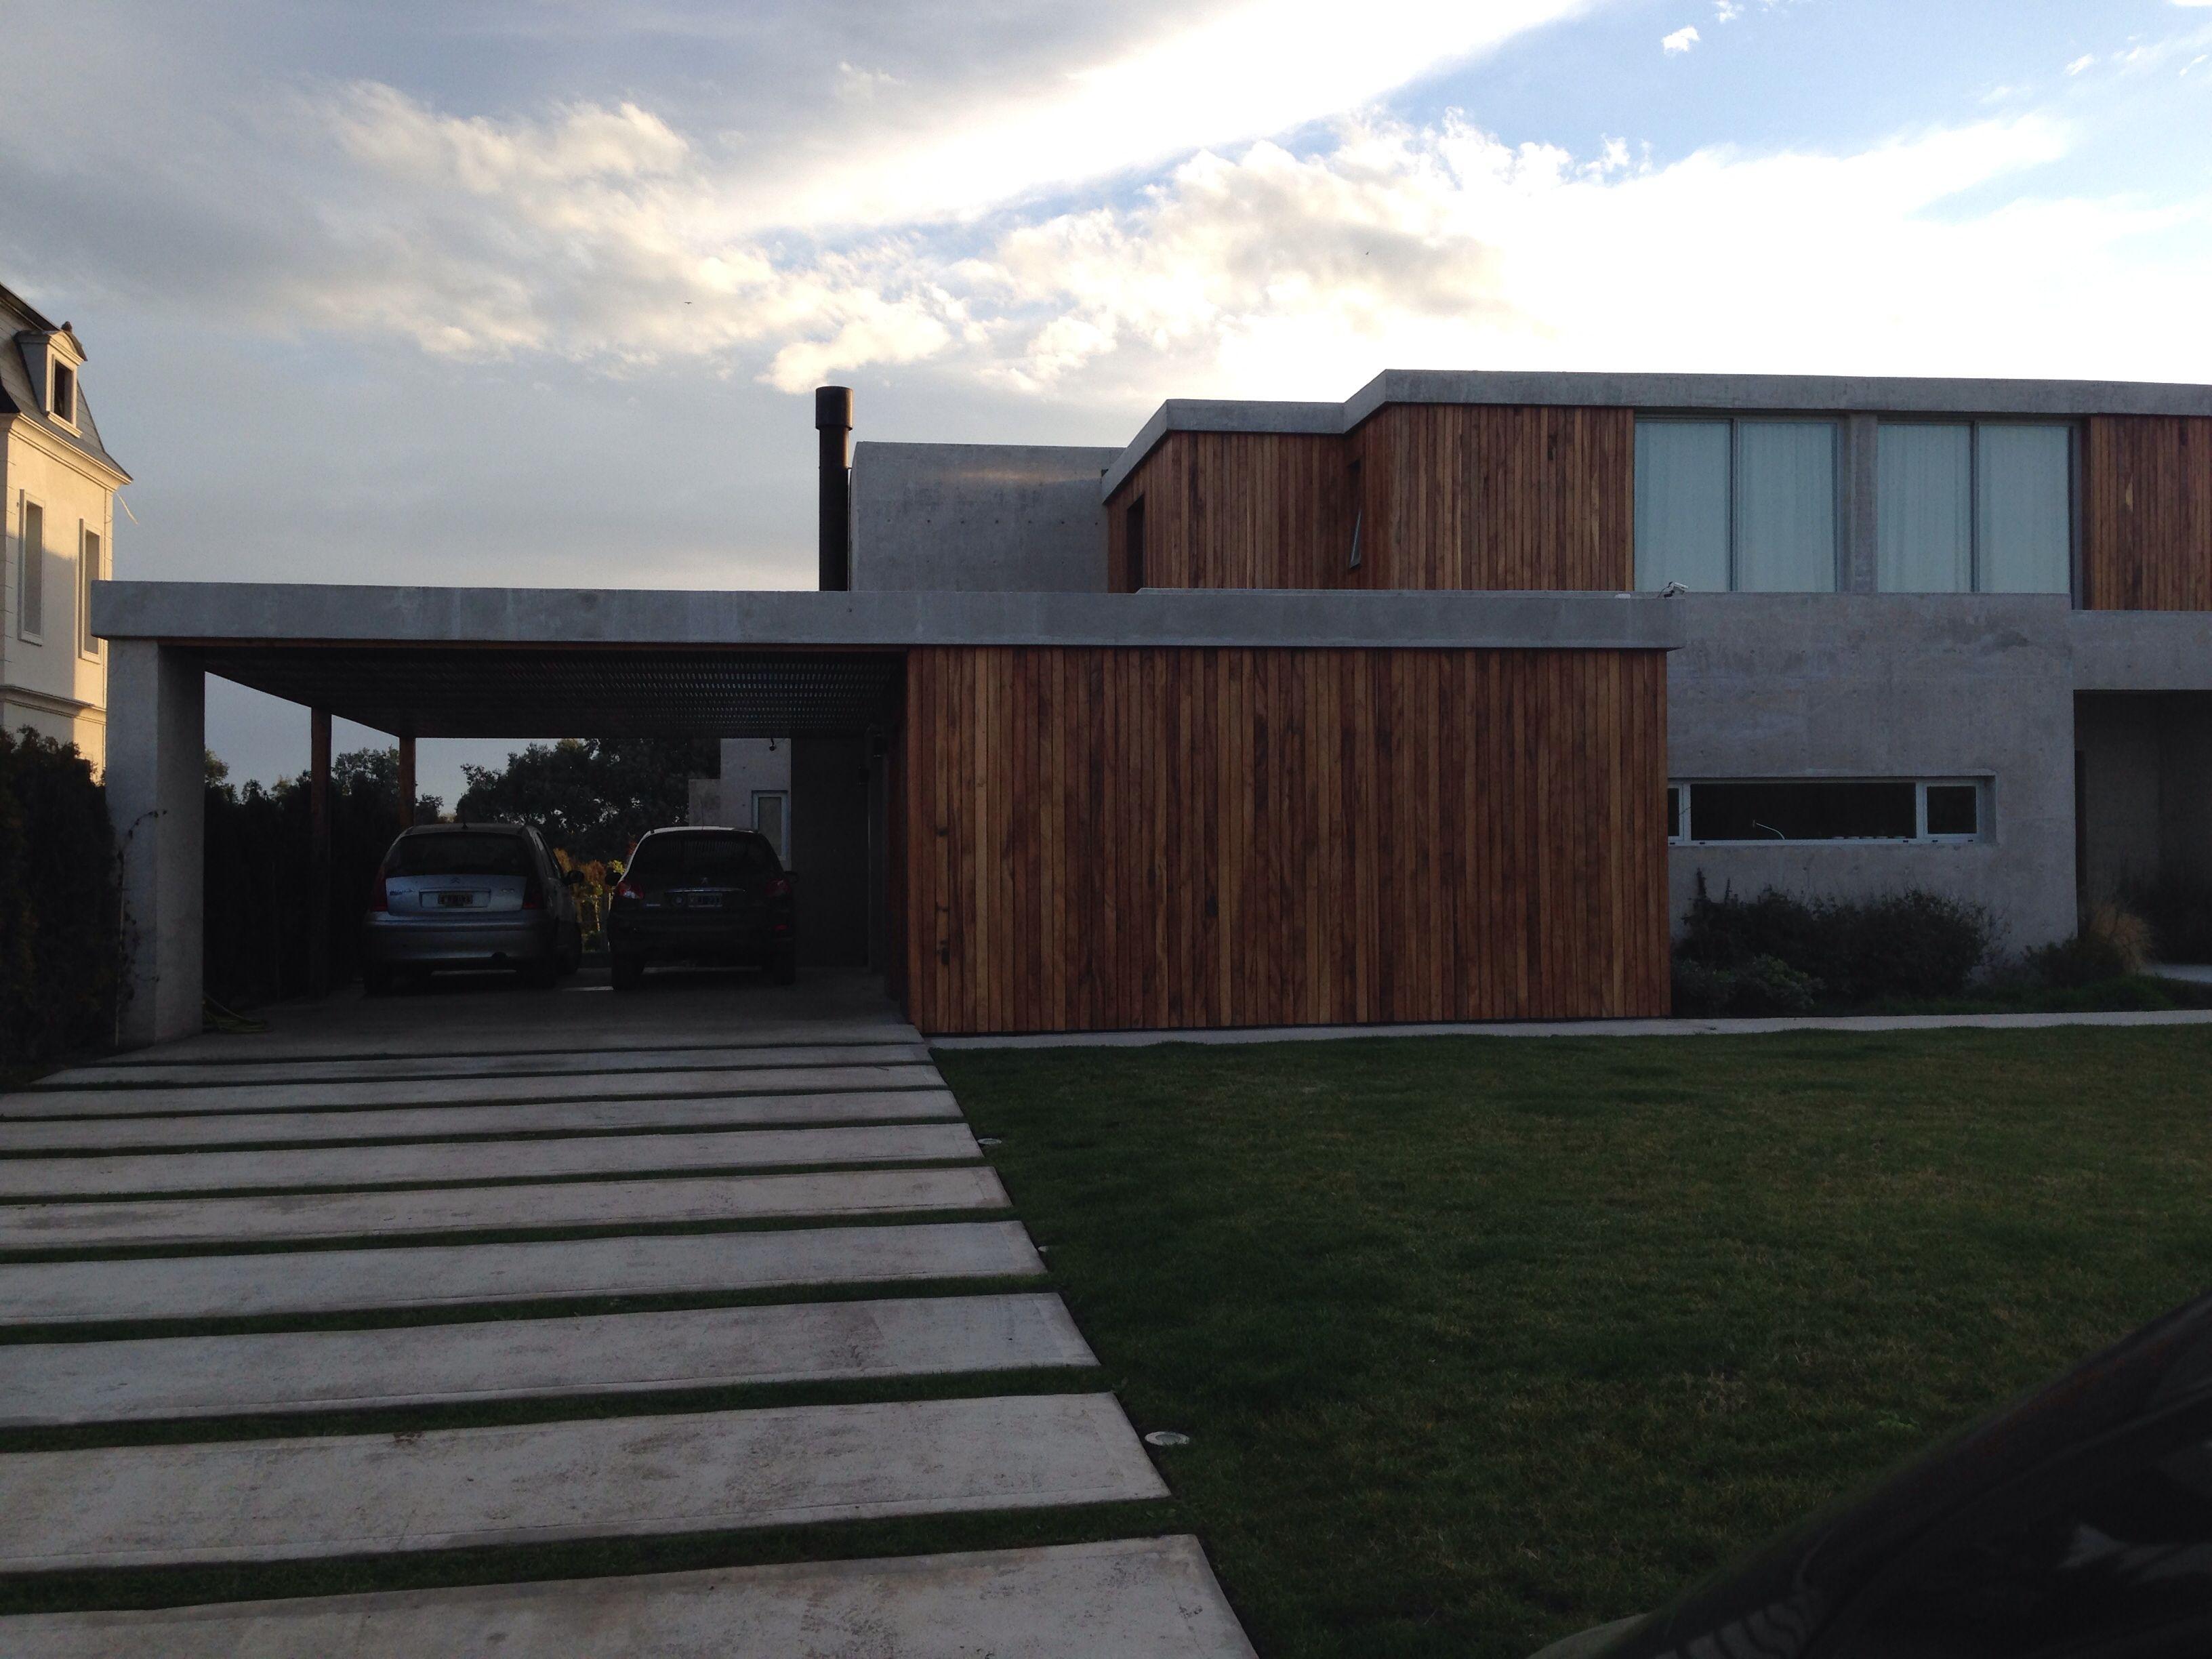 Casa minimalista con entrada de autos entrada casa for Casa minimalista pinterest